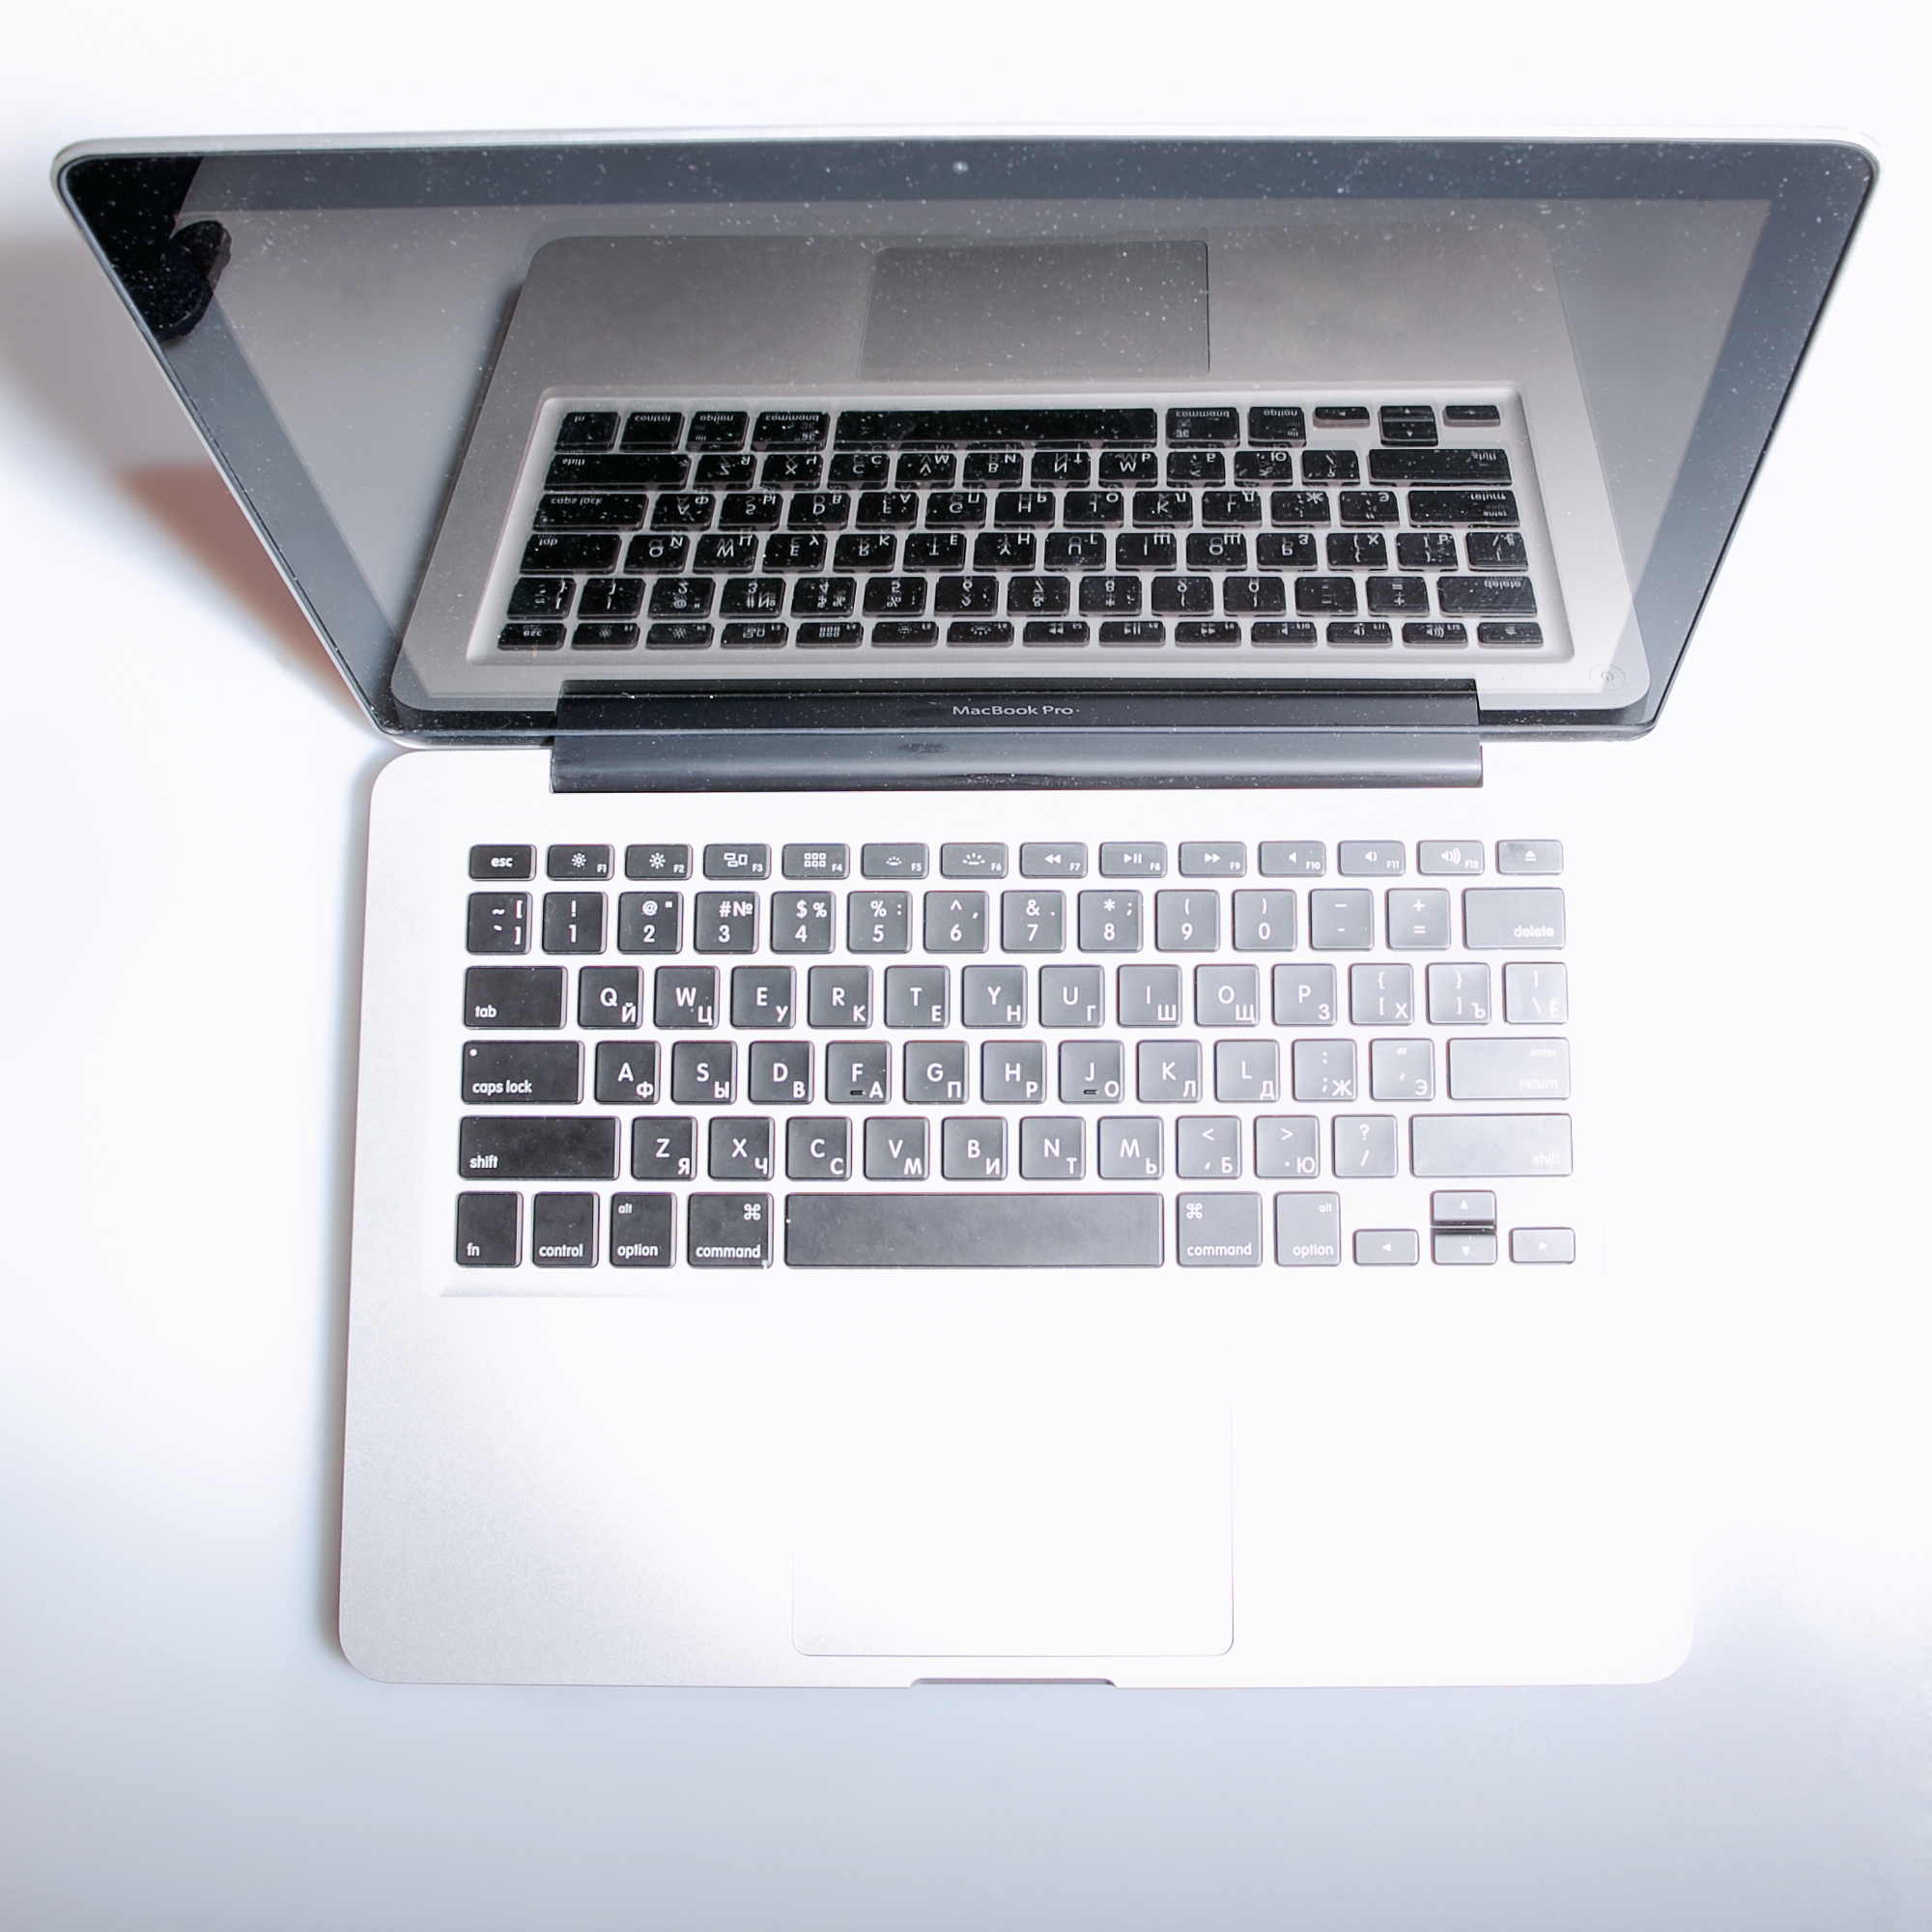 Guía práctica: consejos para comprar un portátil